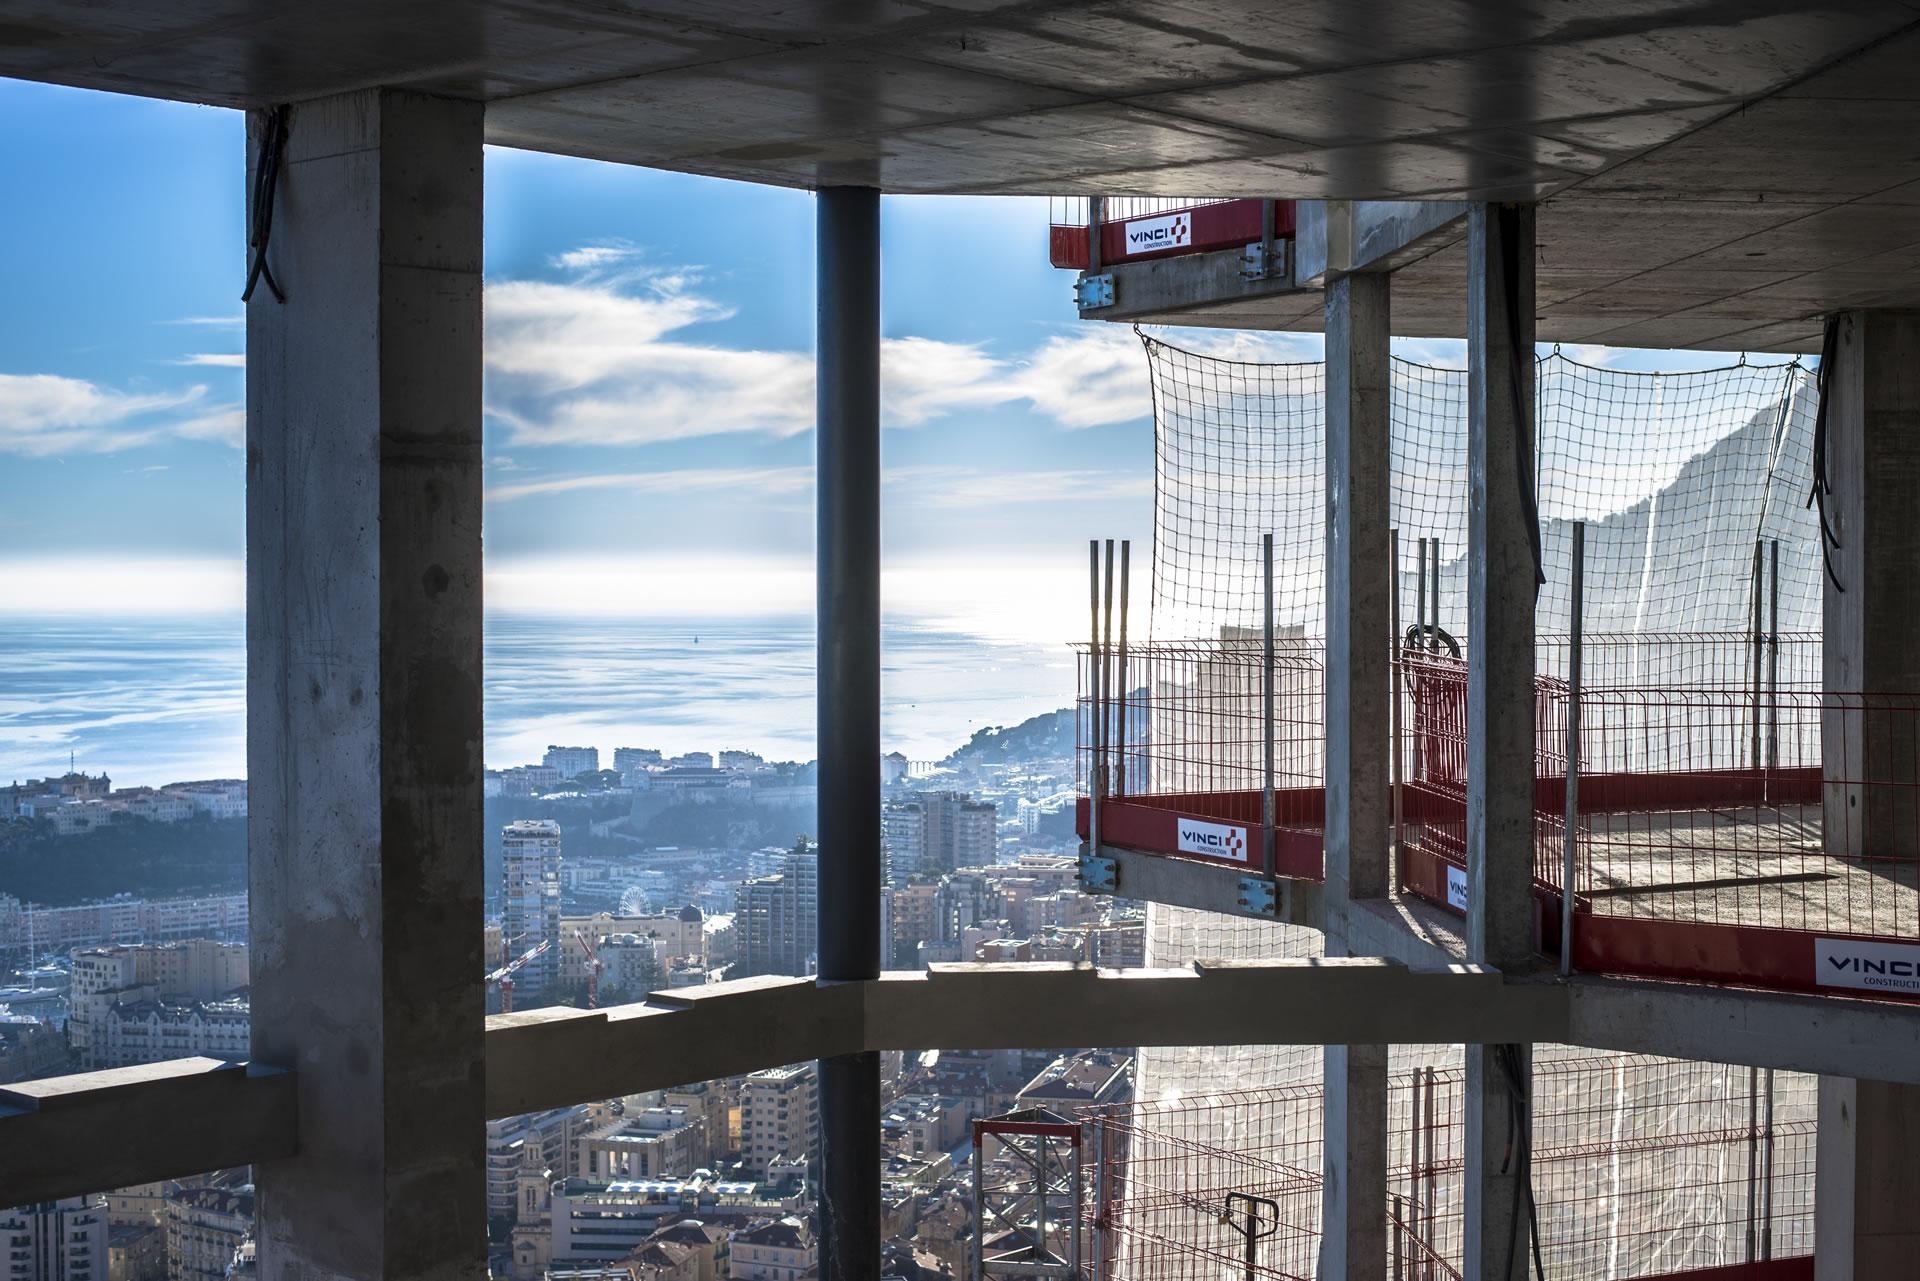 La tour od on chef d uvre architectural exceptionnel for Architecte monaco